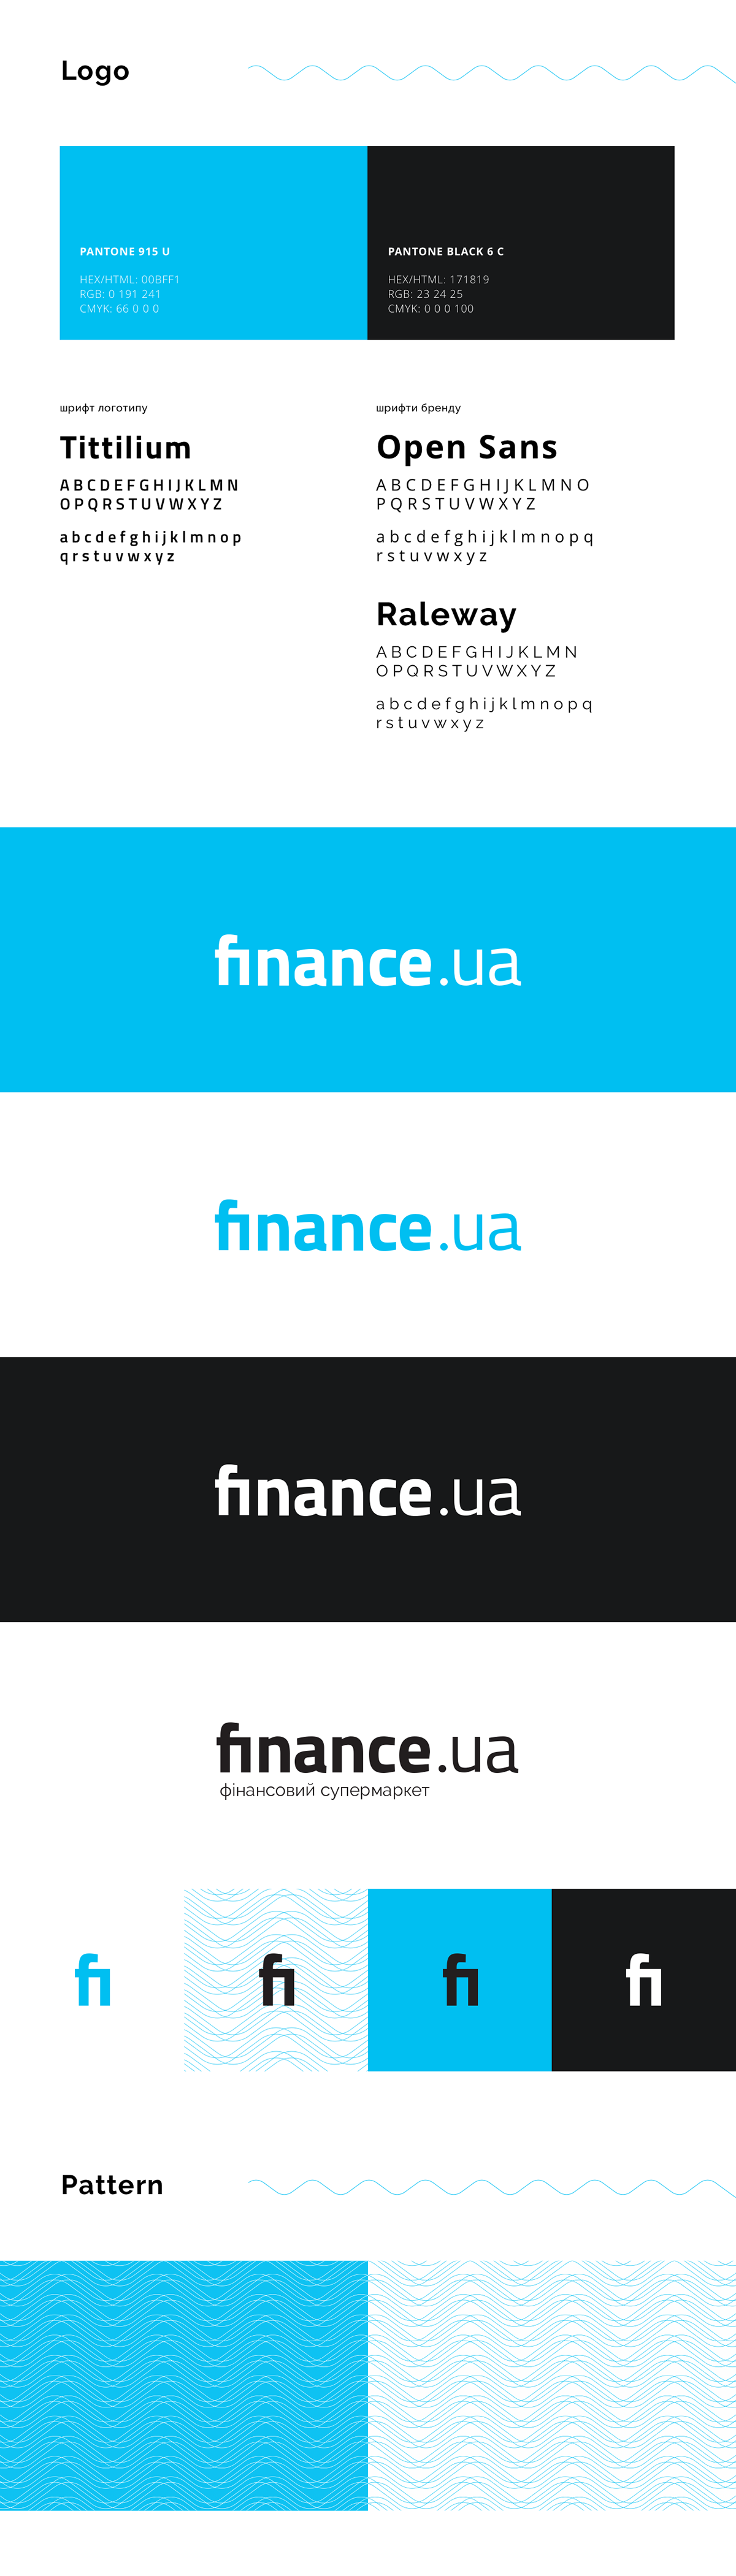 identity logo Logotype branding  finance pattern